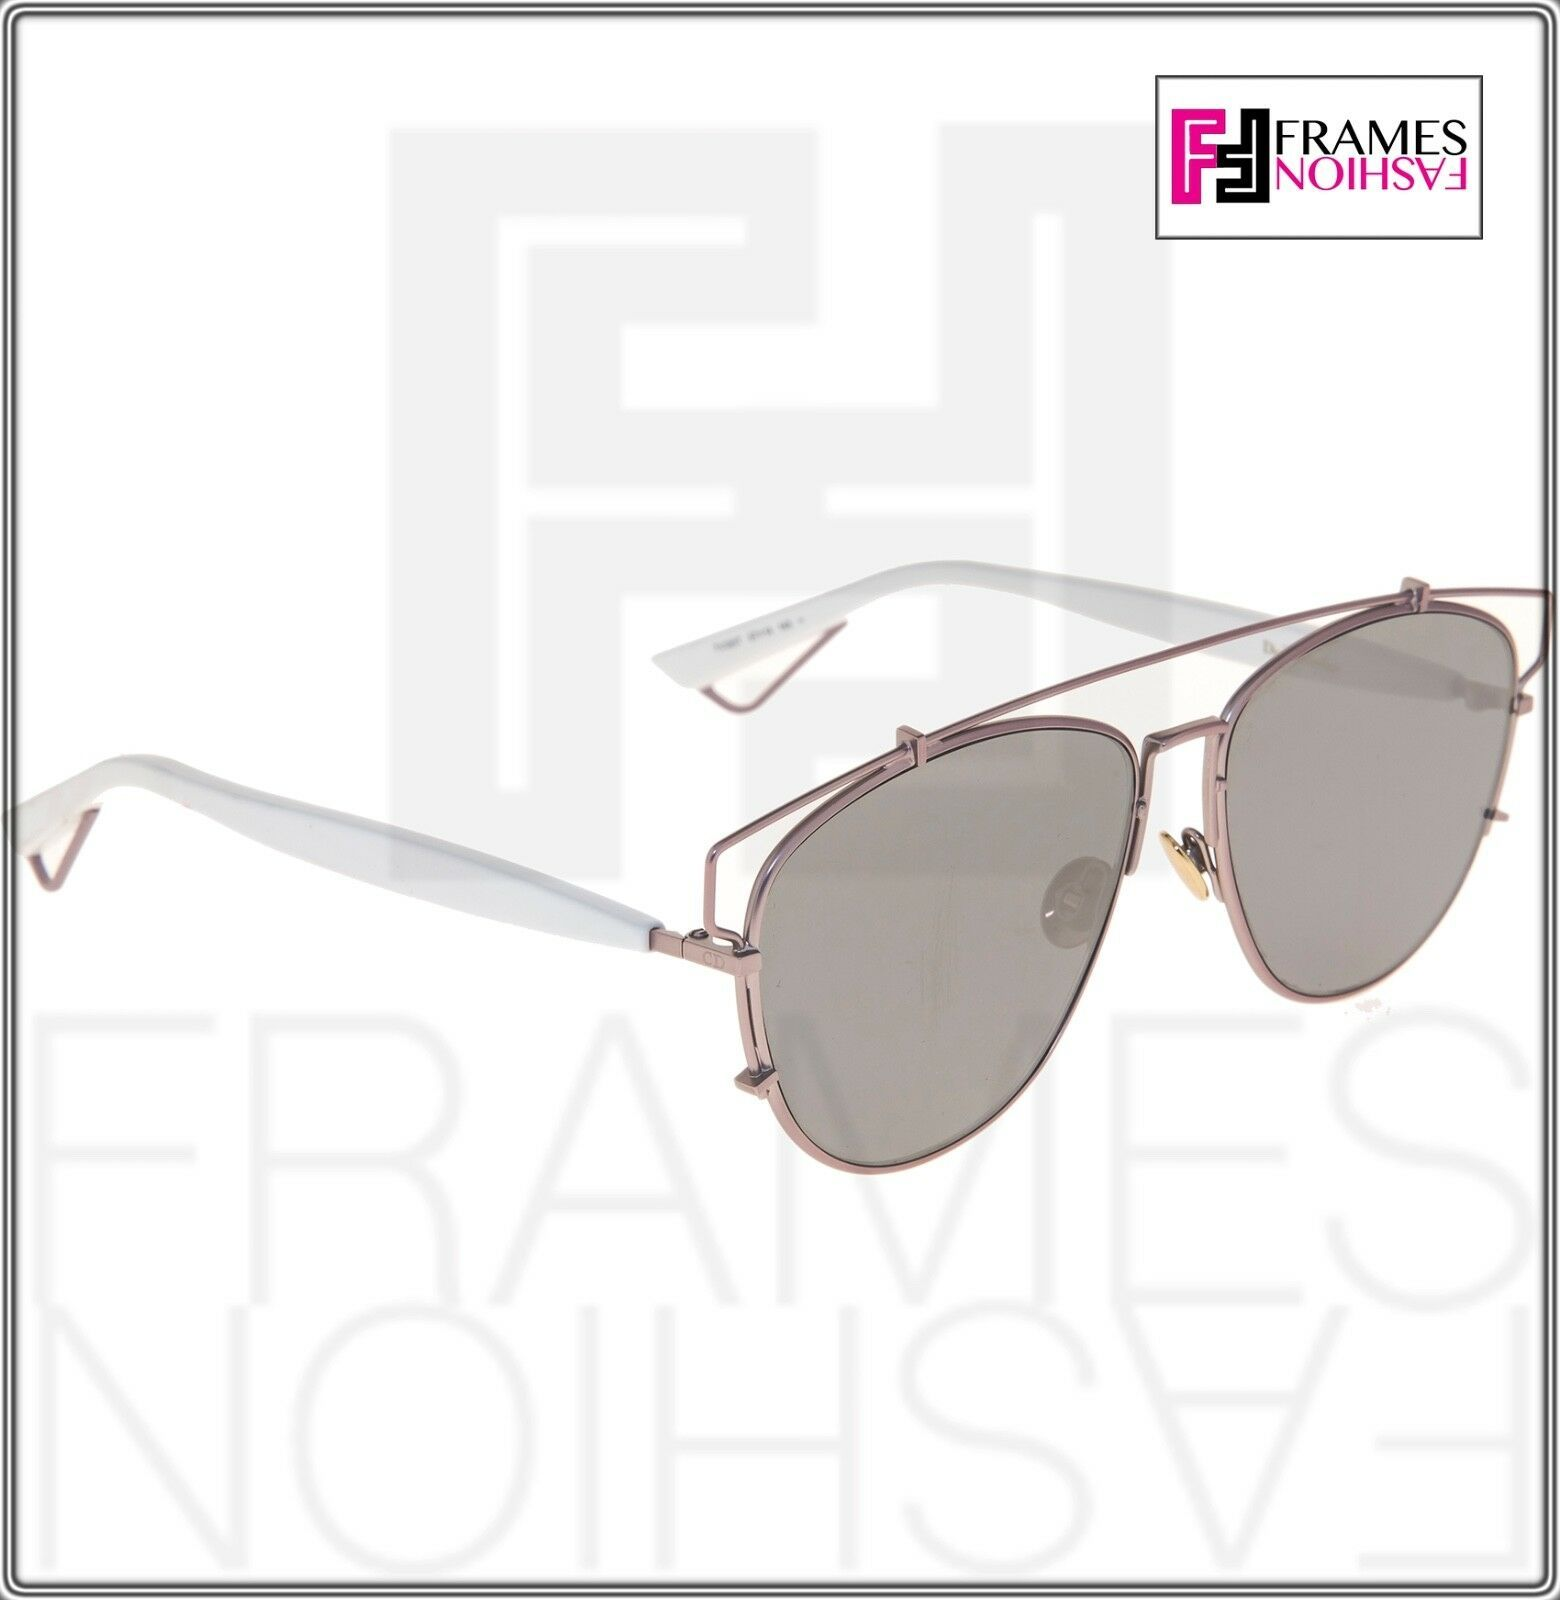 CHRISTIAN DIOR TECHNOLOGIC White Lilac Flash Mirrored Sunglasses DIORTECHNOLOGIC image 5